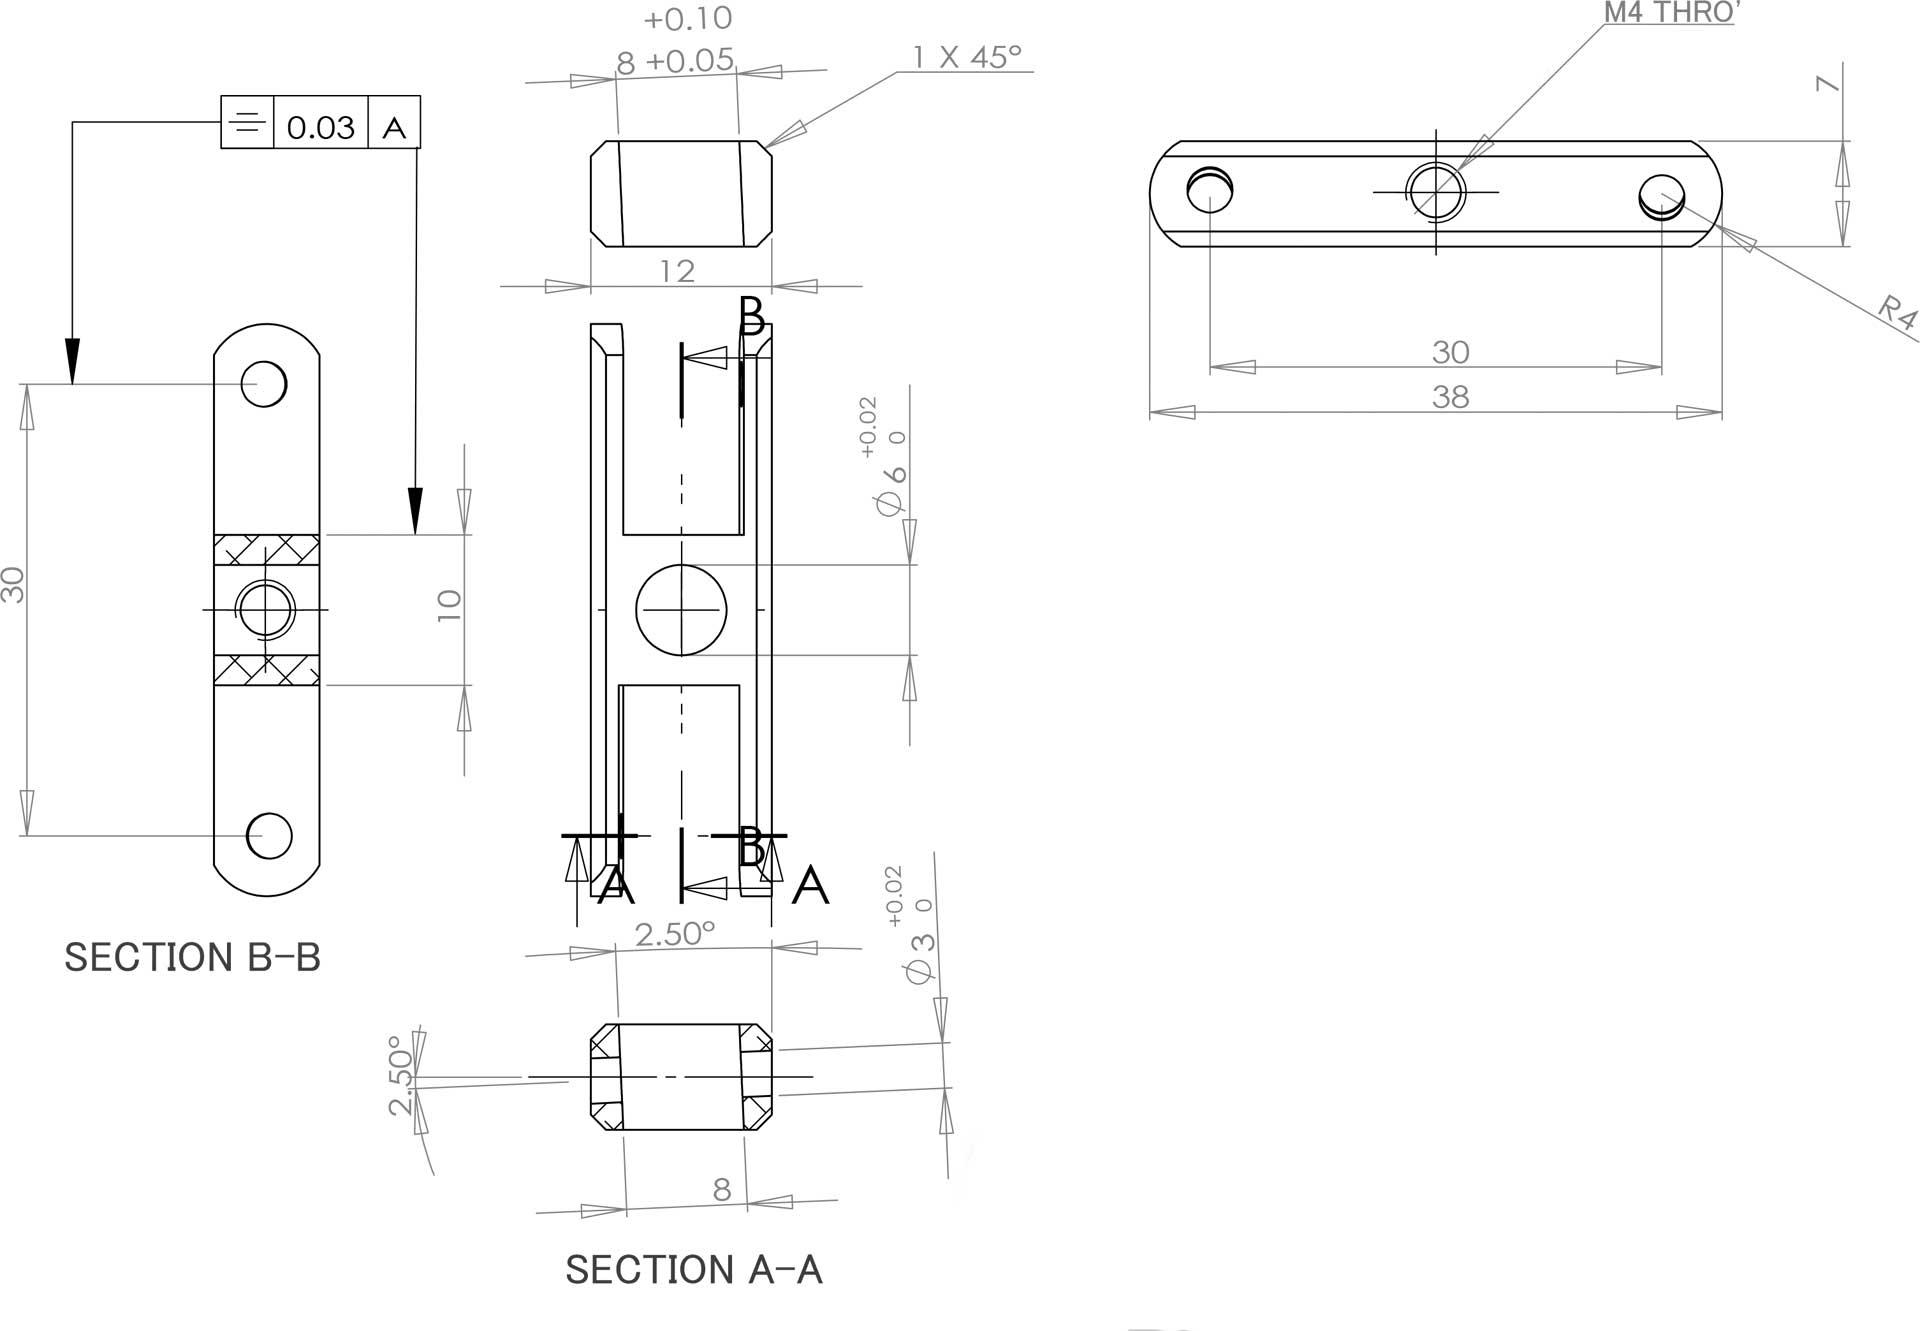 Robbe Modellsport avec telteil LS 3522/5, 20mm, 2,5°, 5mm